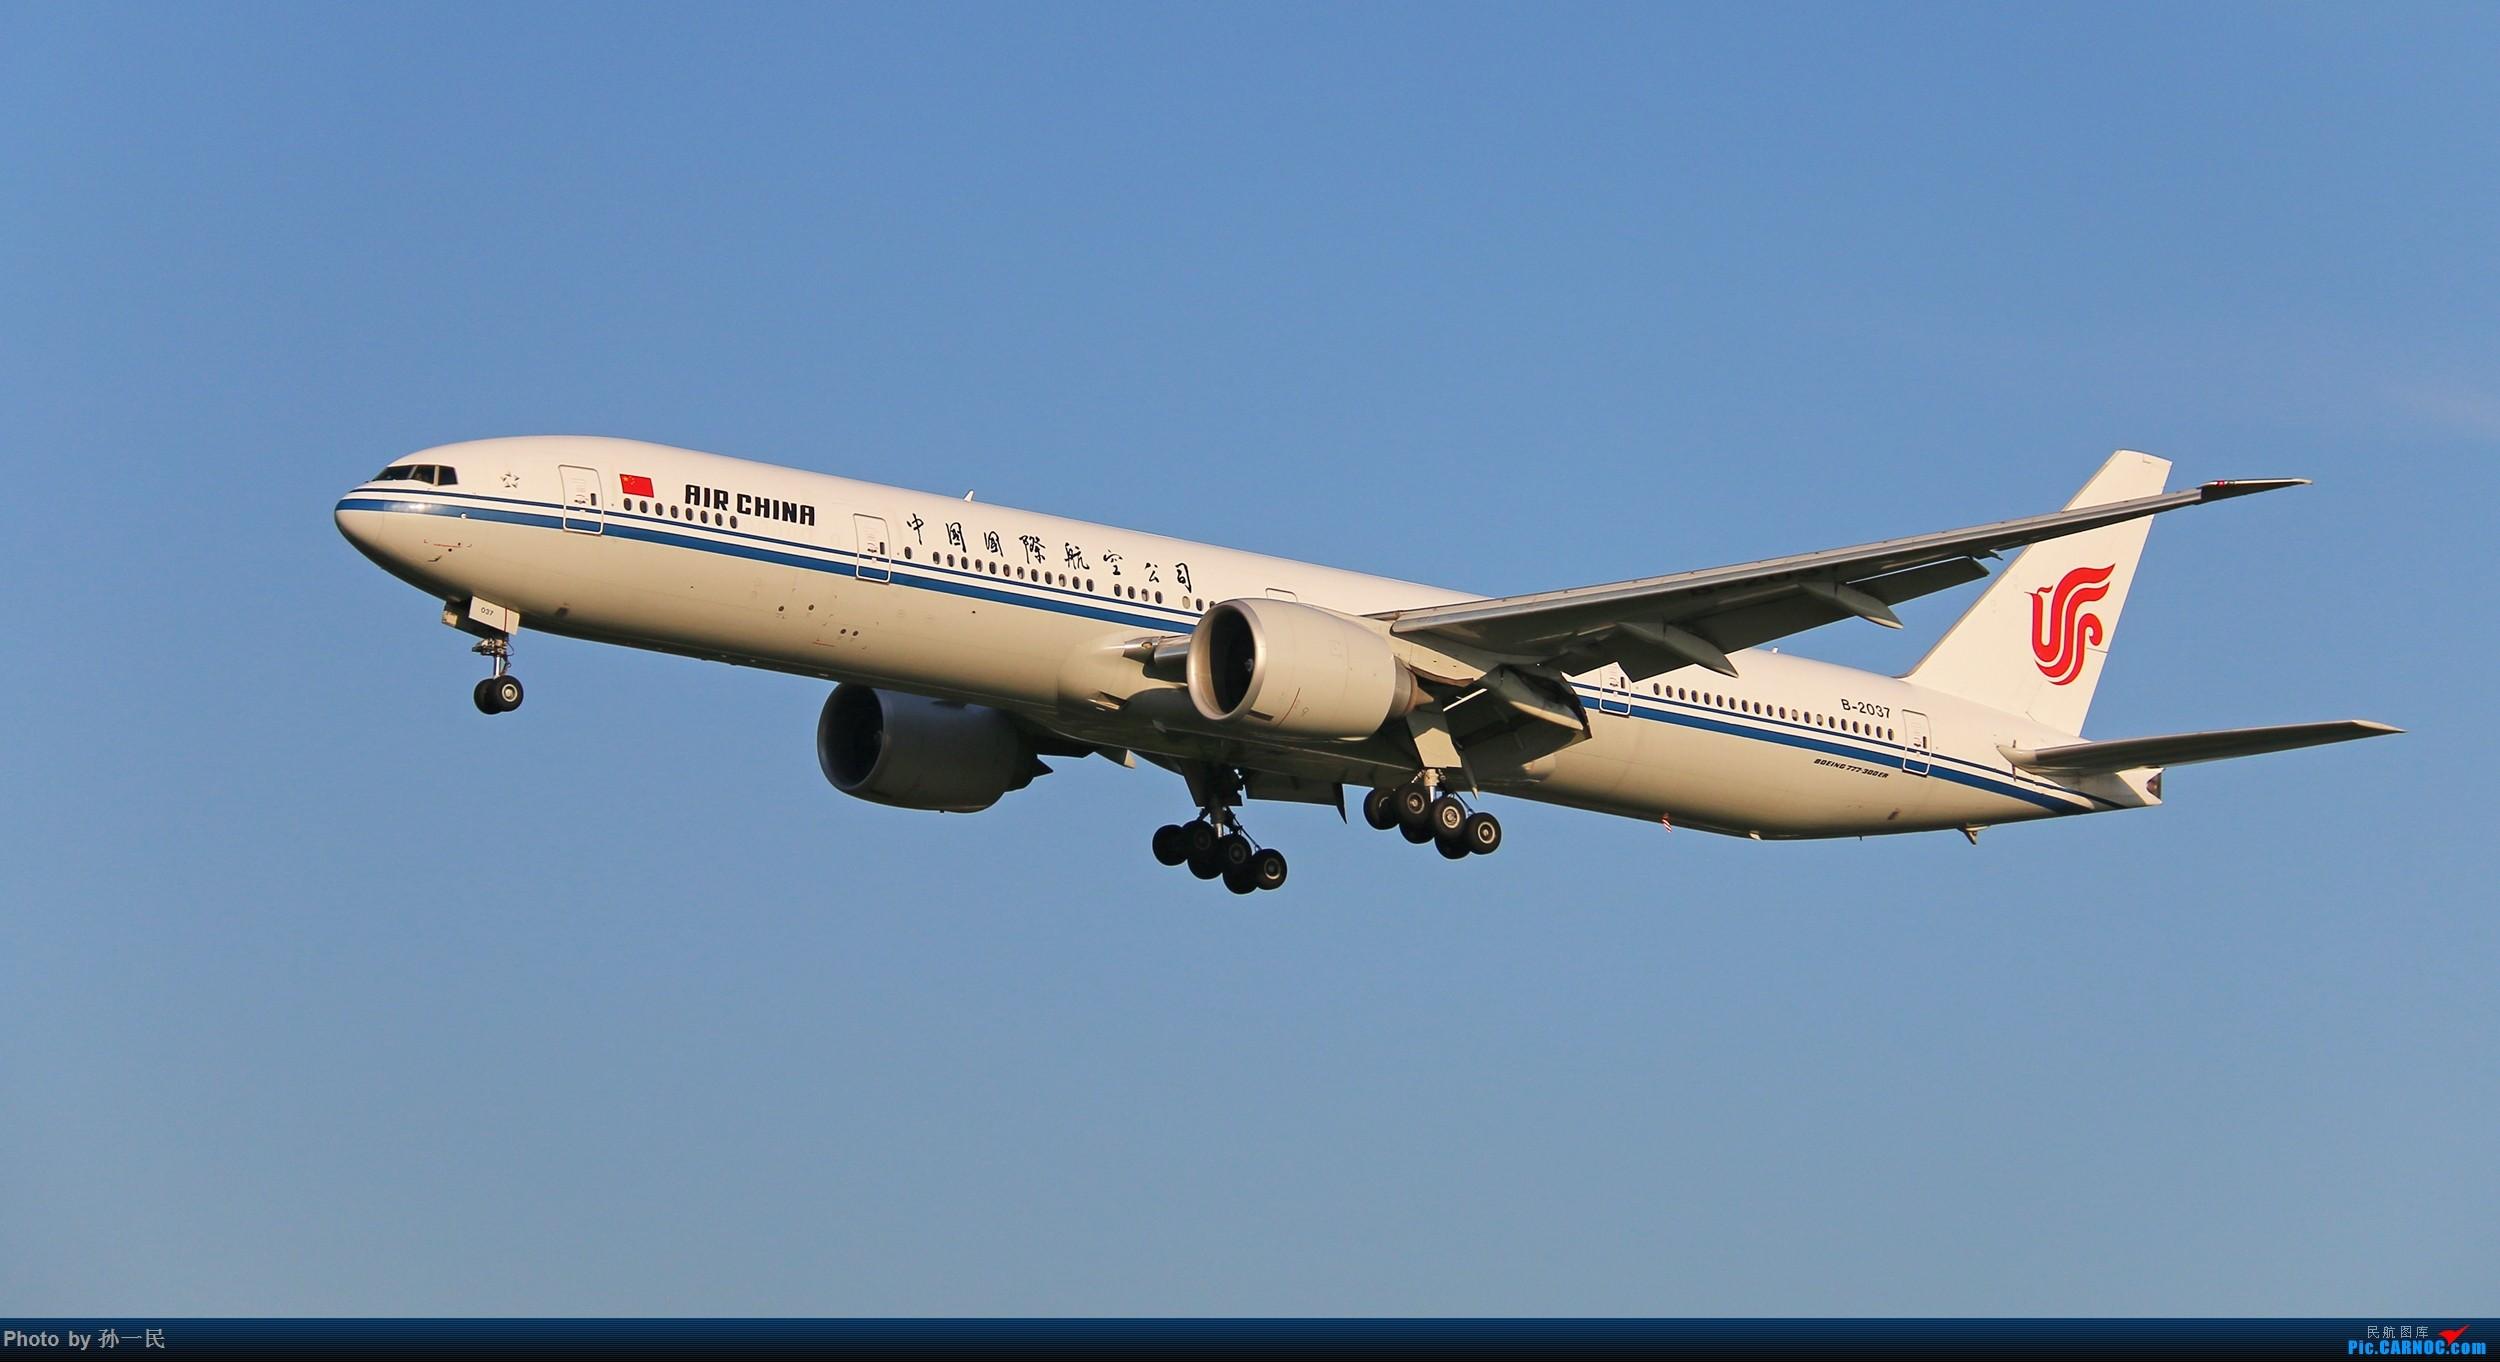 Re:[原创]大晴天杂图一组 BOEING 777-300ER B-2037 中国北京首都国际机场